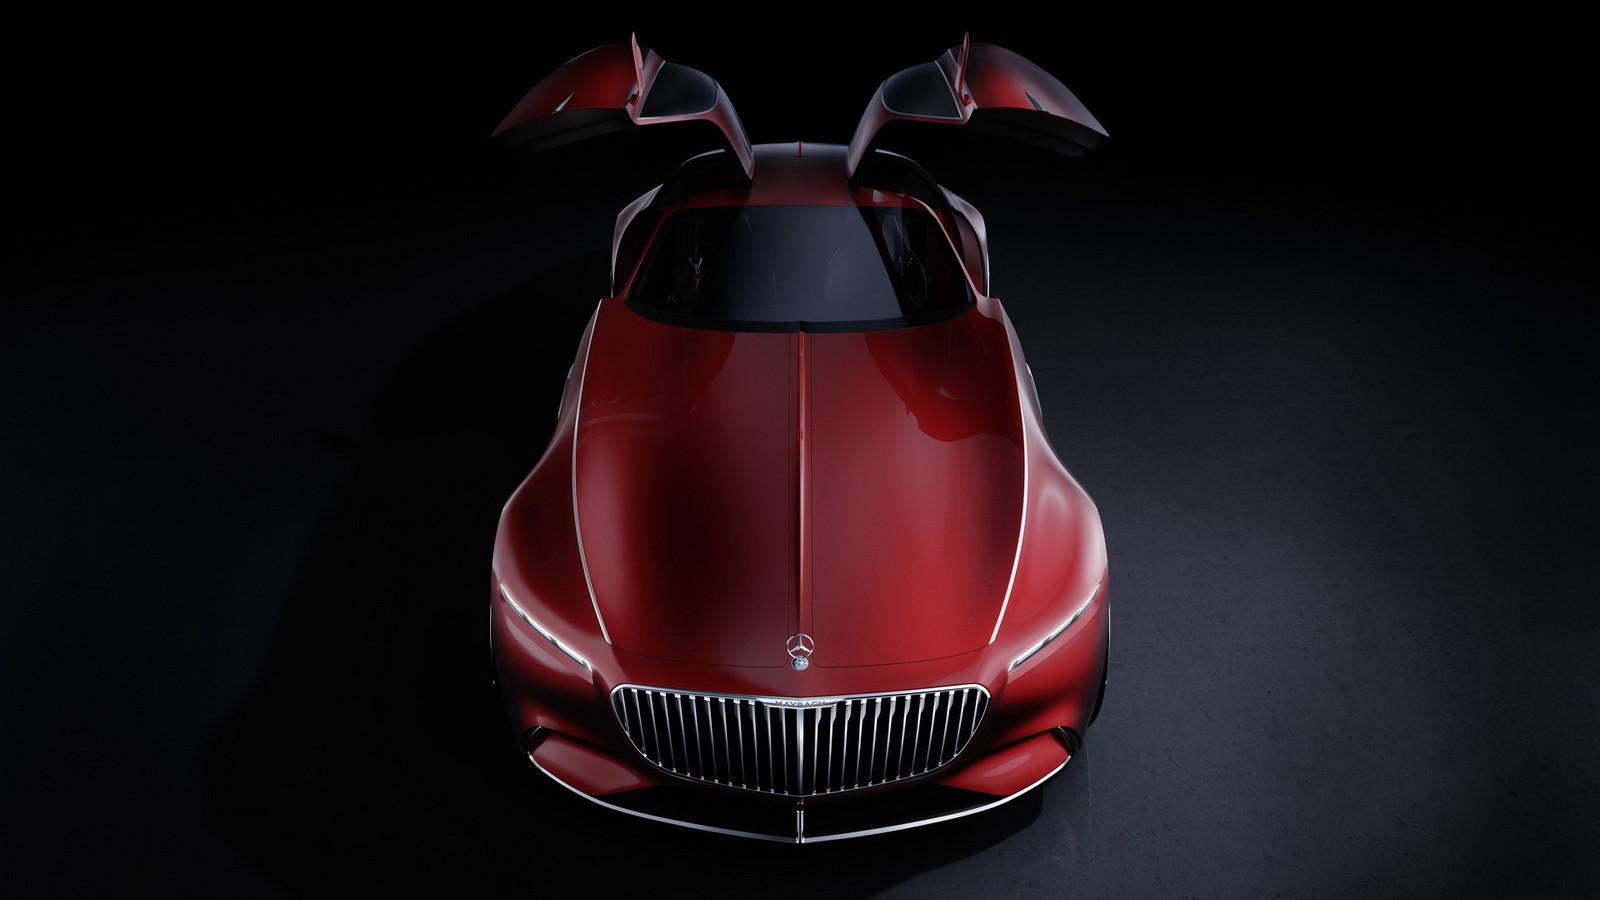 Мега-купе Mercedes-Maybach представили официально